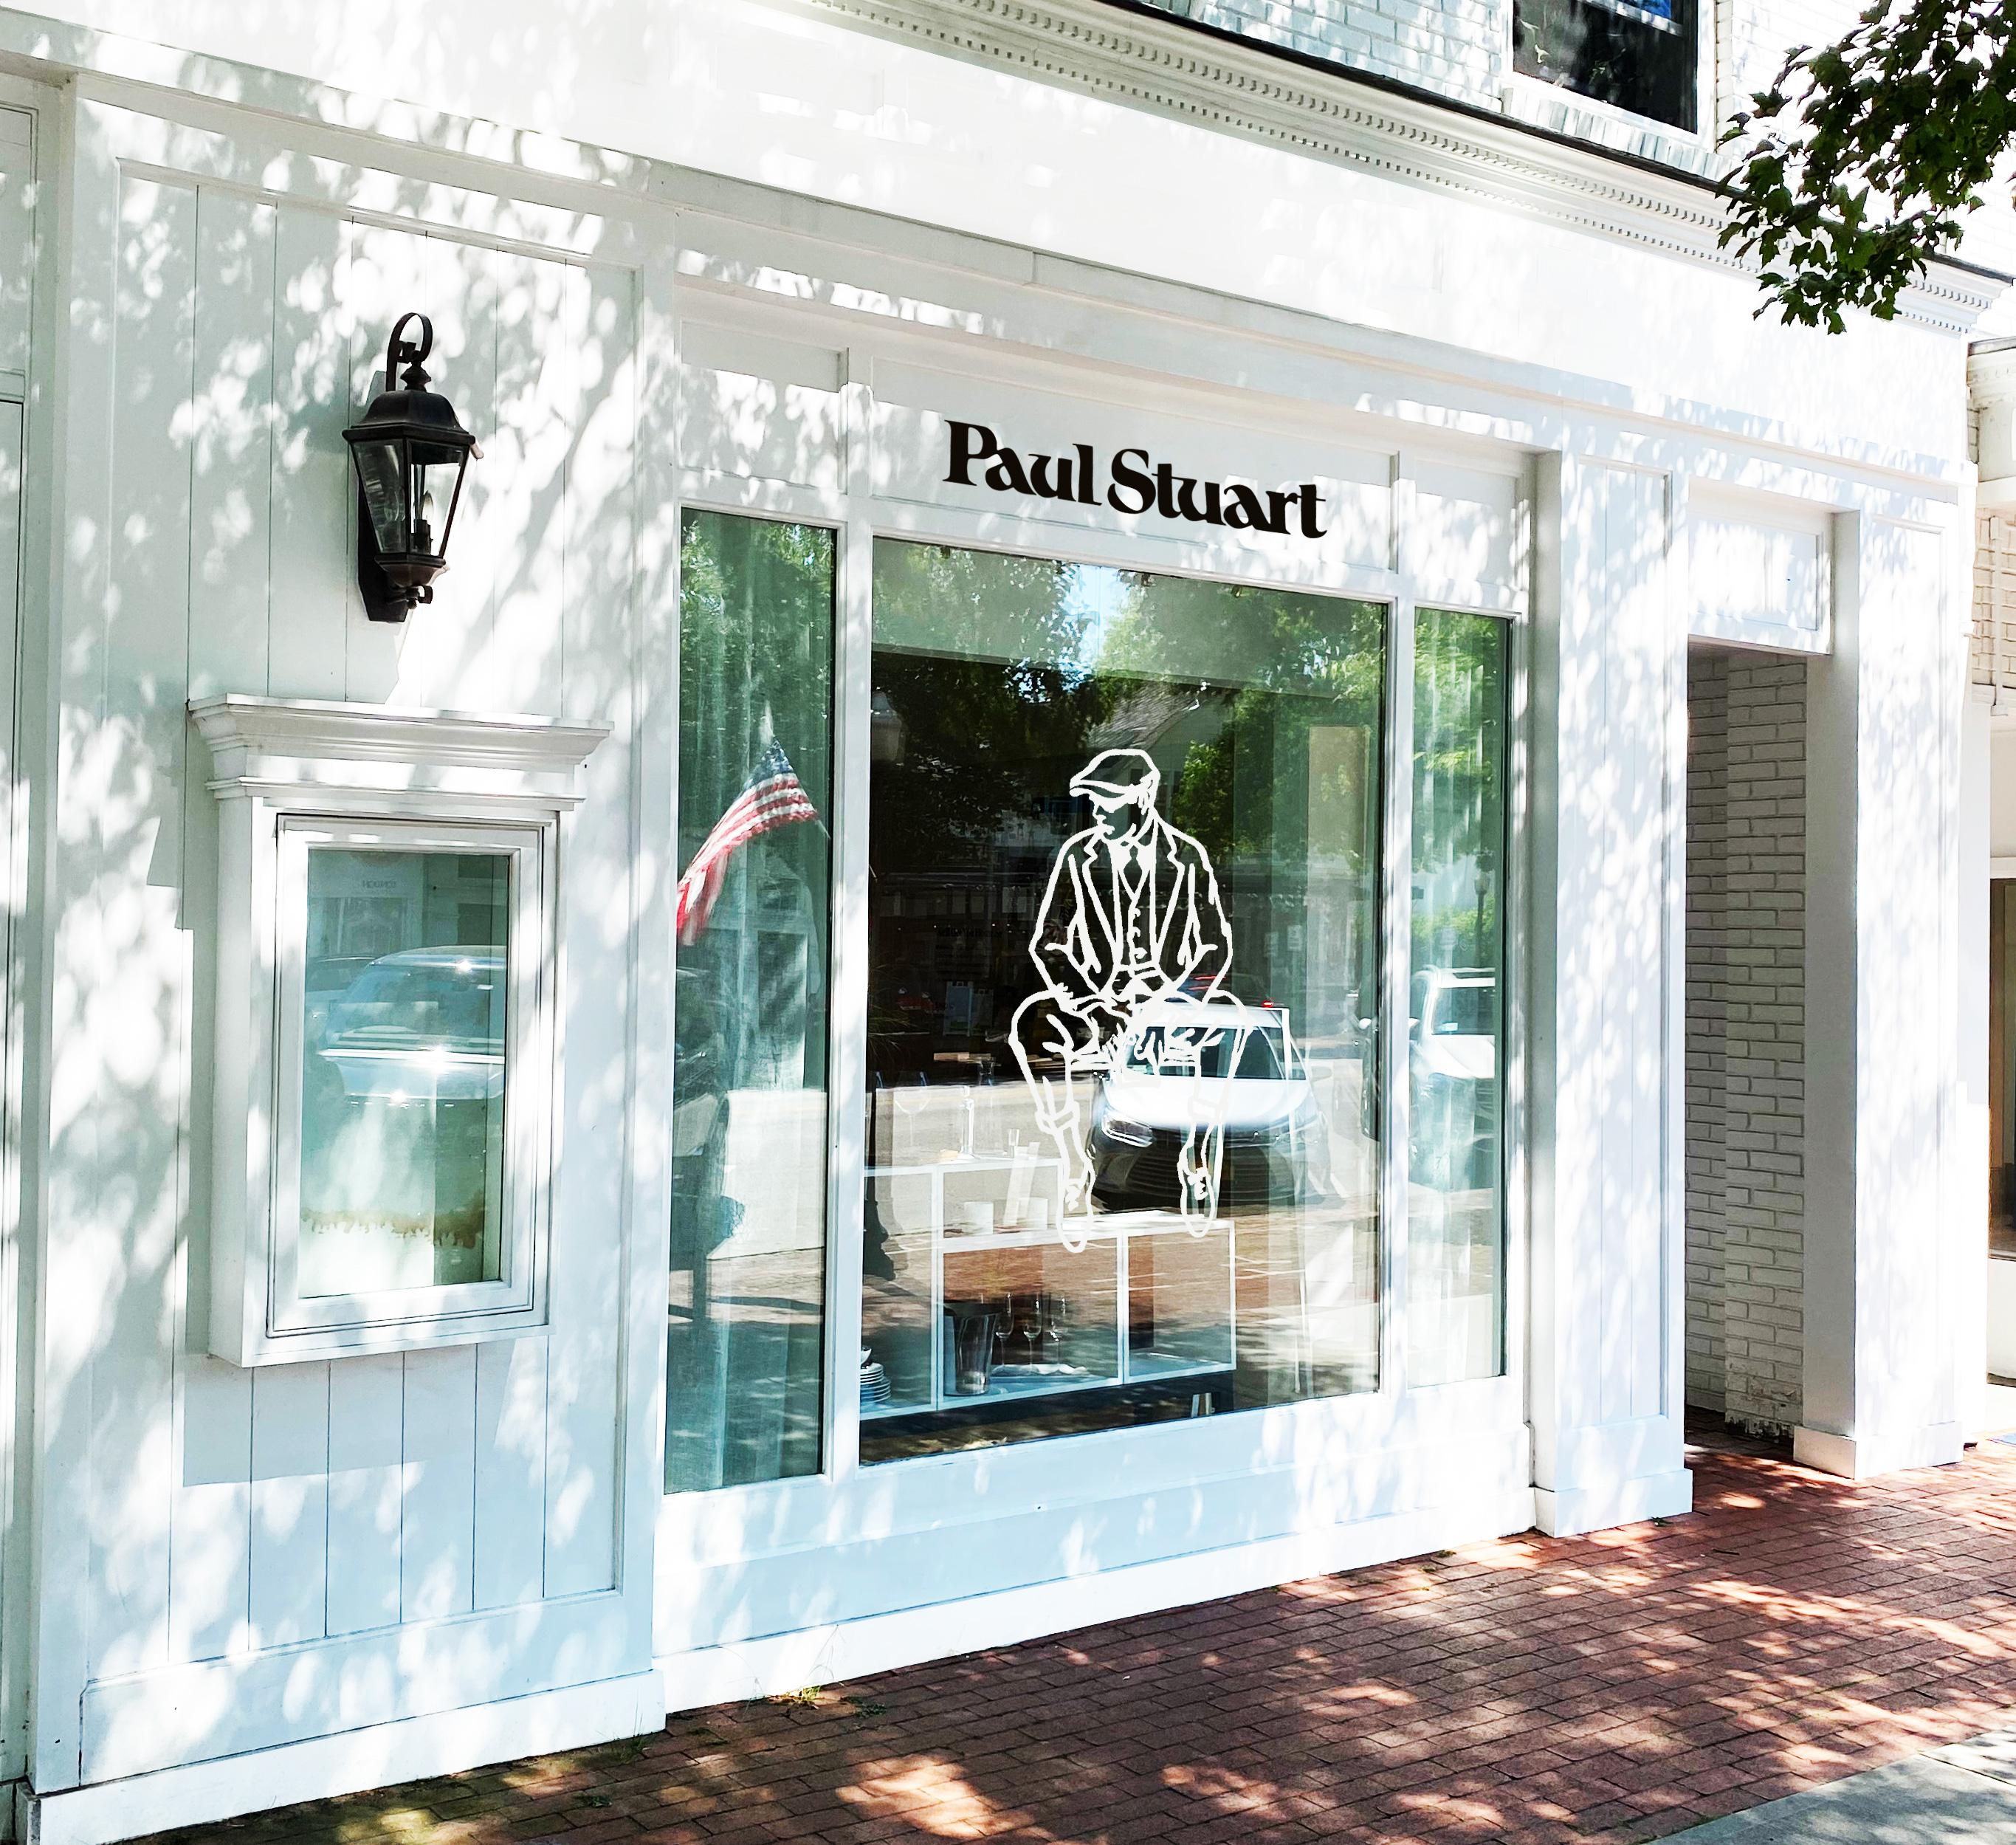 The Paul Stuart's pop-up store in the Hamptons.